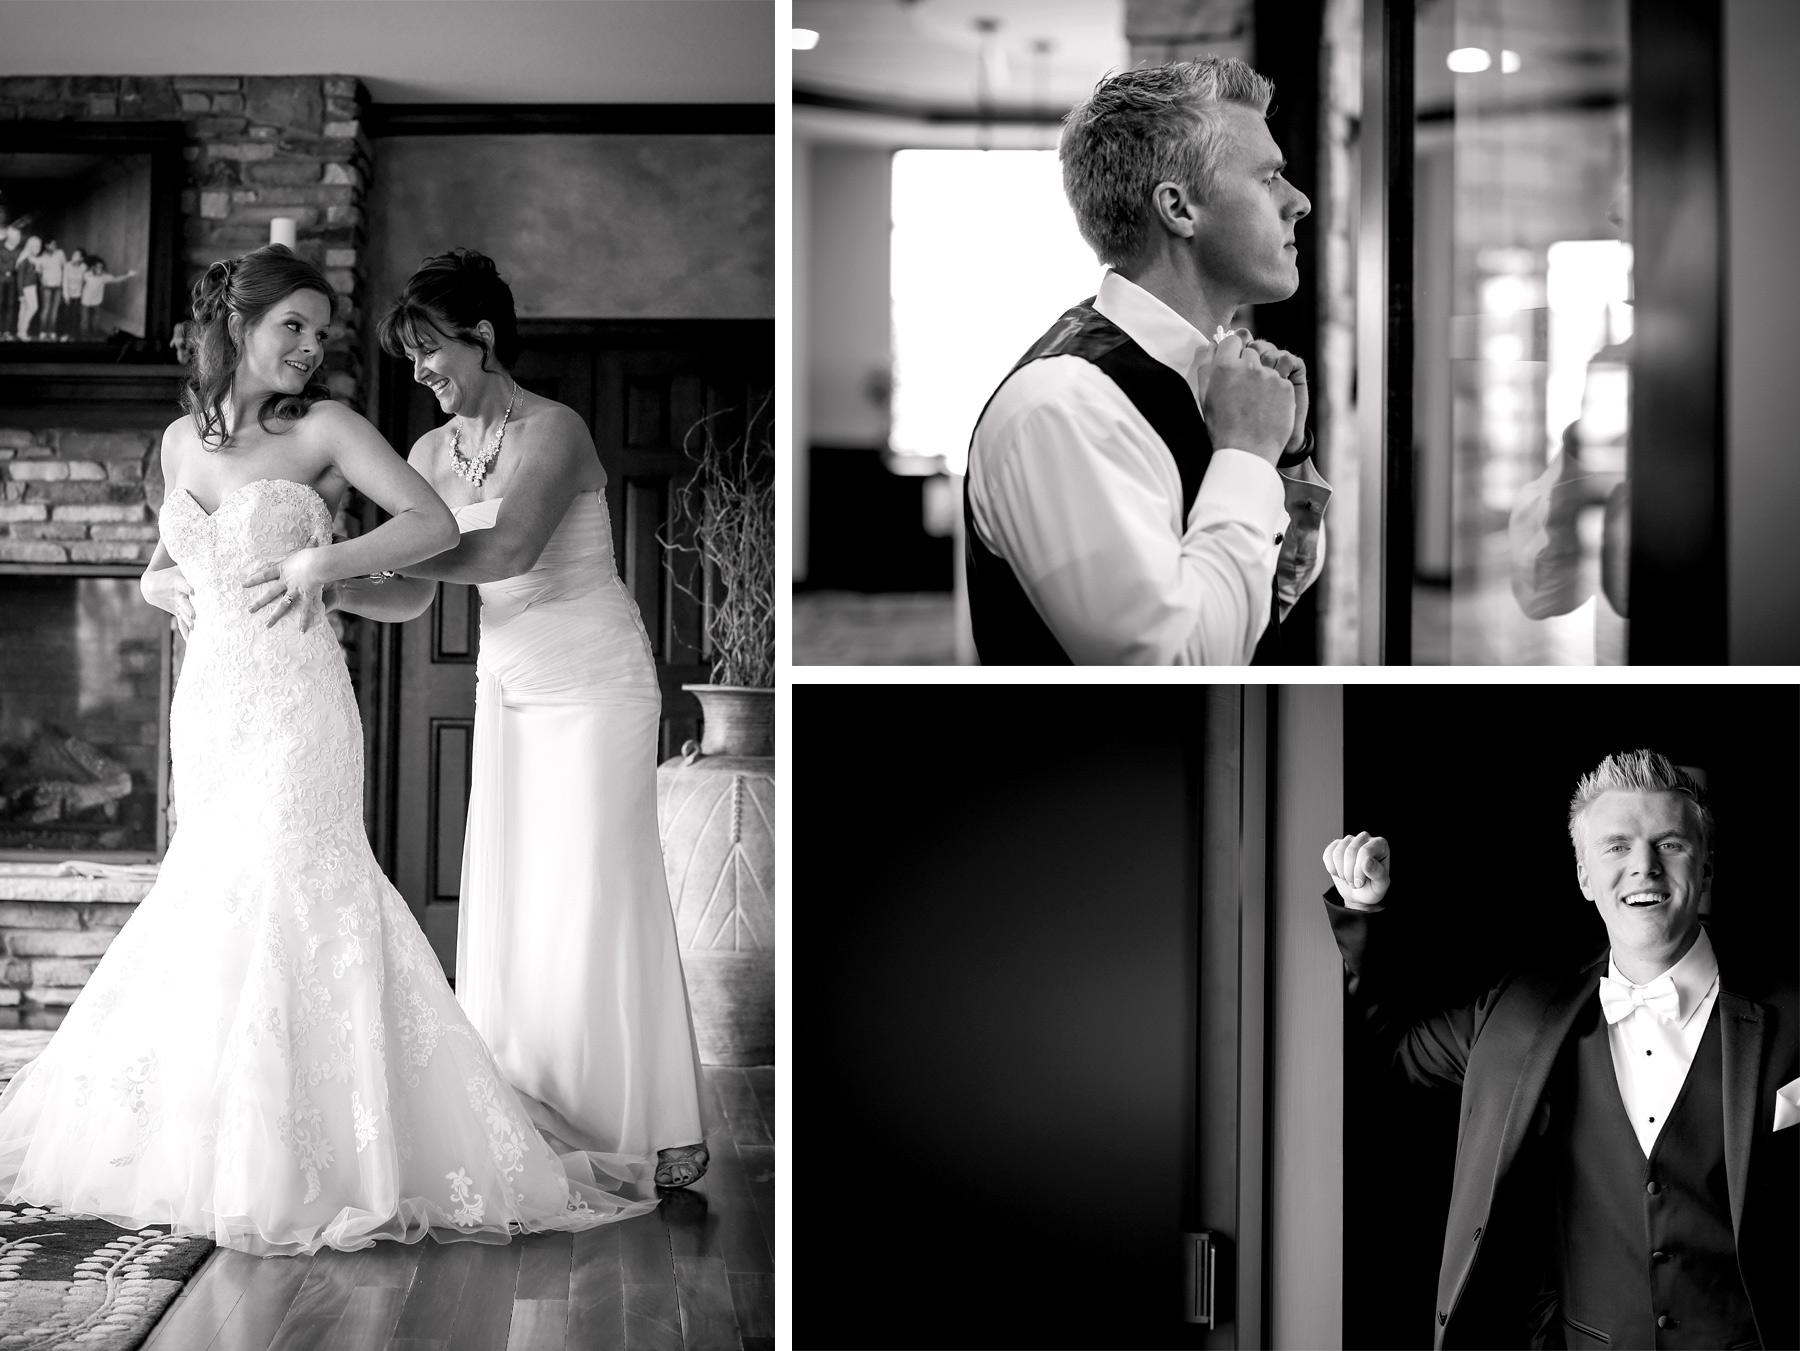 01-Minneapolis-Minnesota-Wedding-Photography-by-Vick-Photography-Wedding-Morning-Tianna-&-Matt.jpg